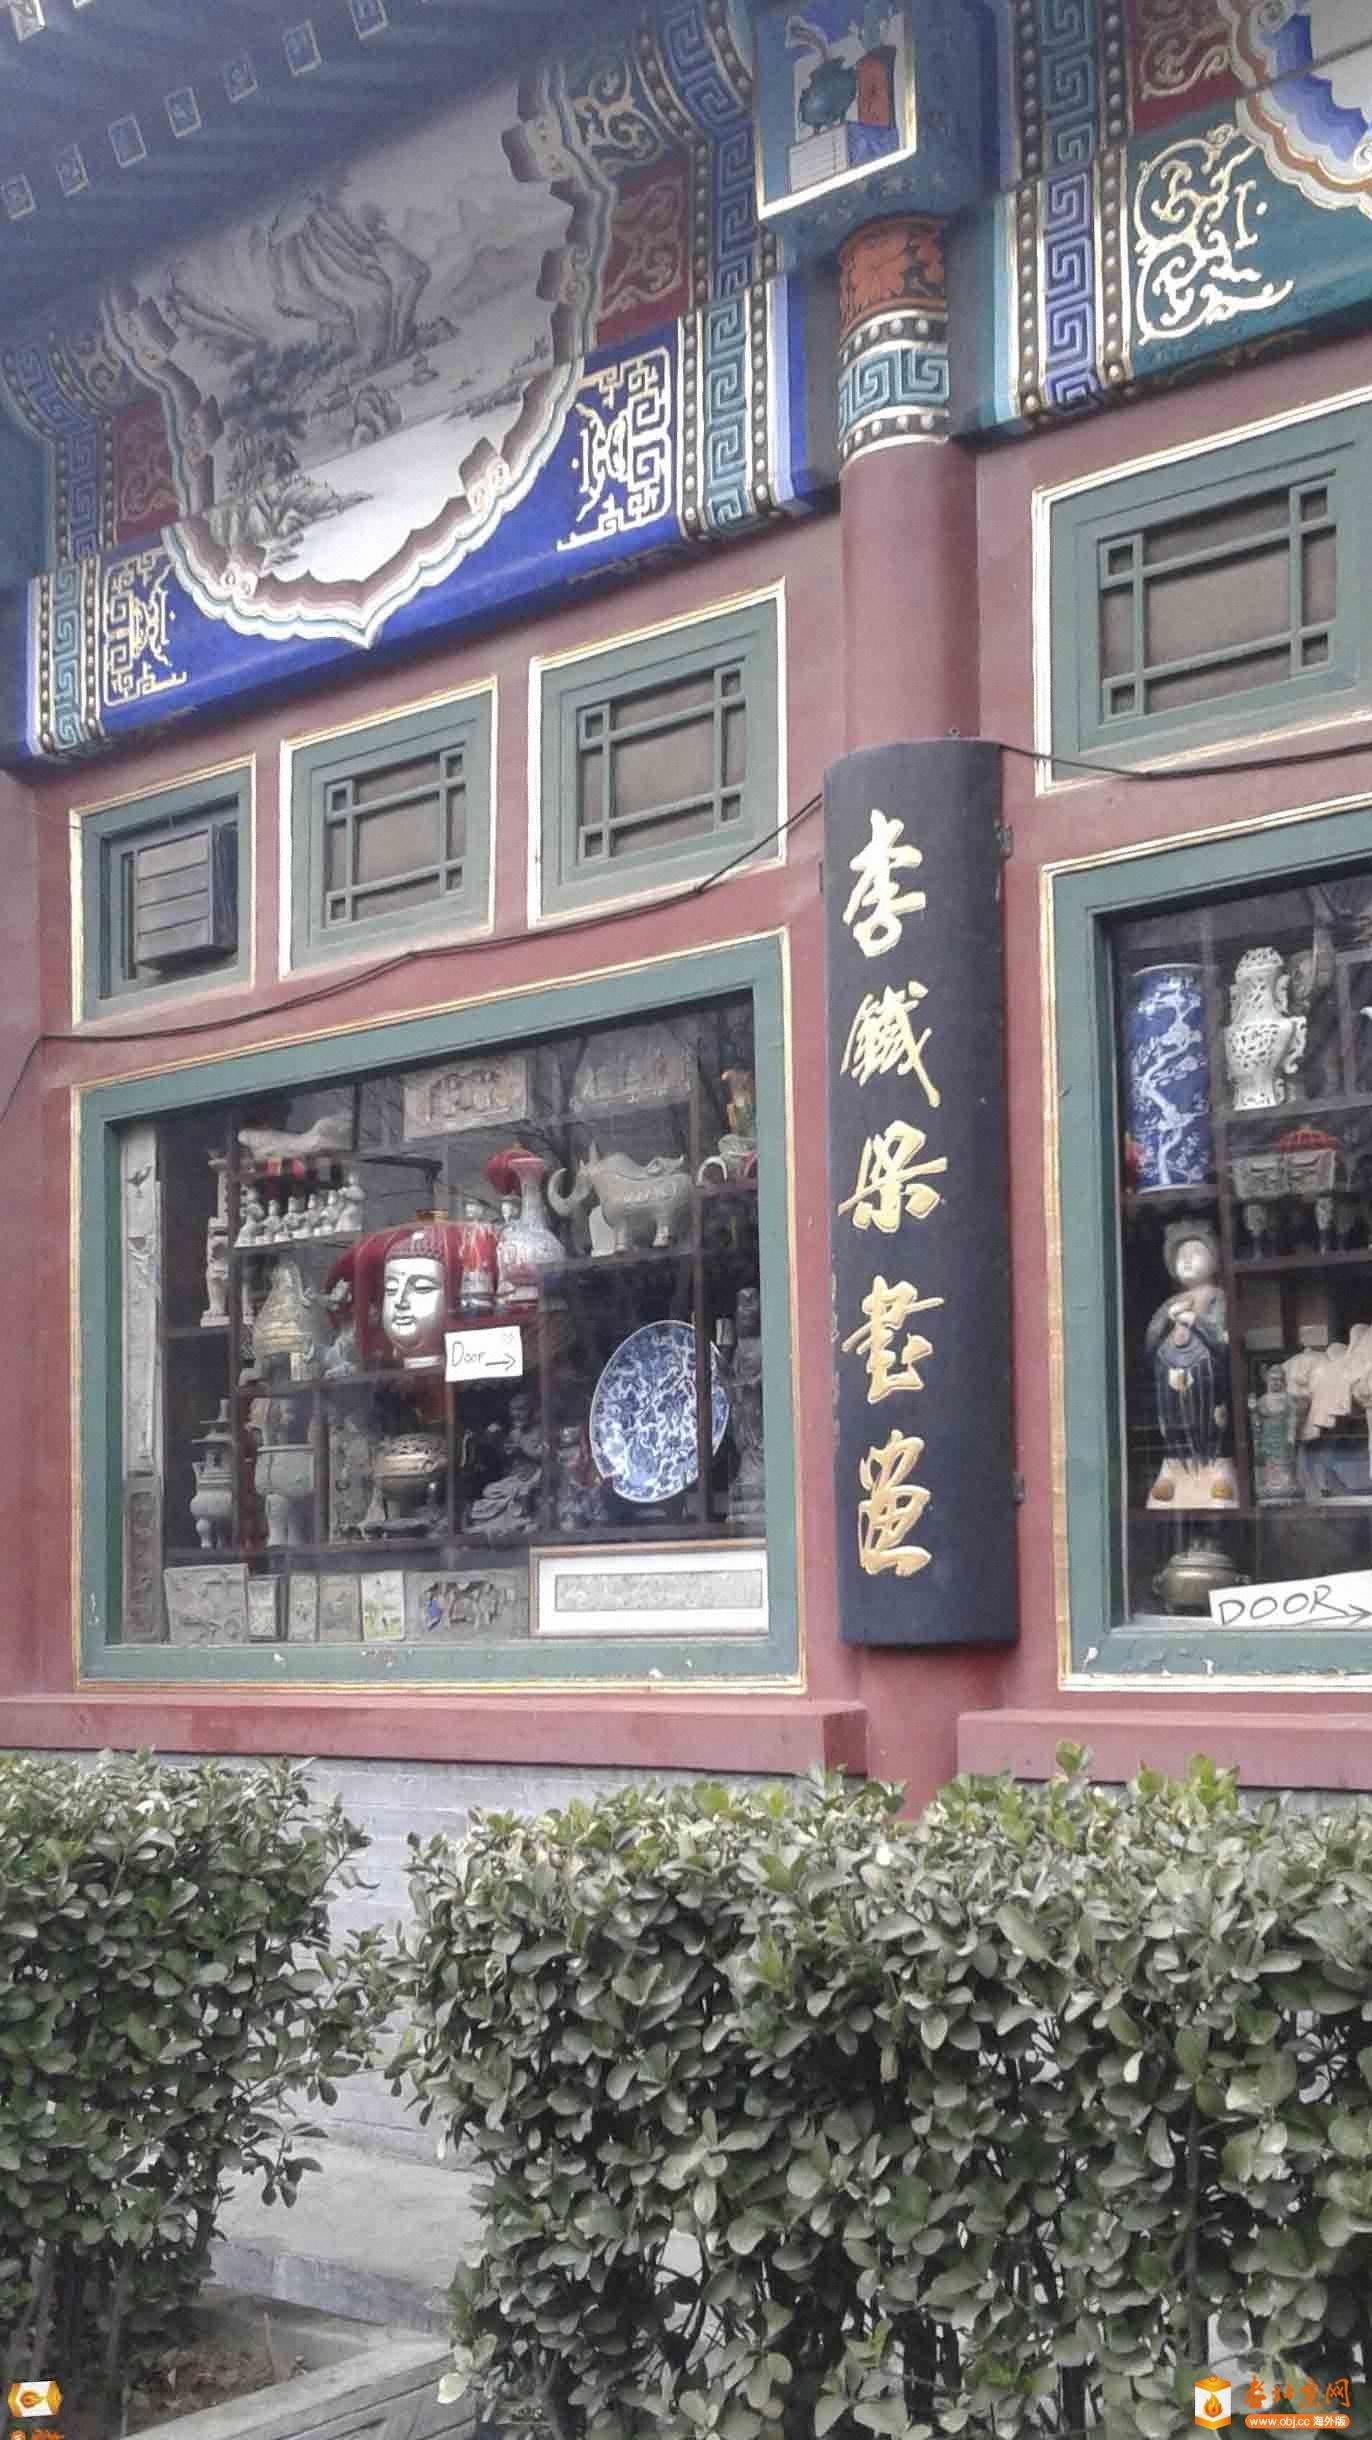 RE: 2016年春节厂甸初四庙会